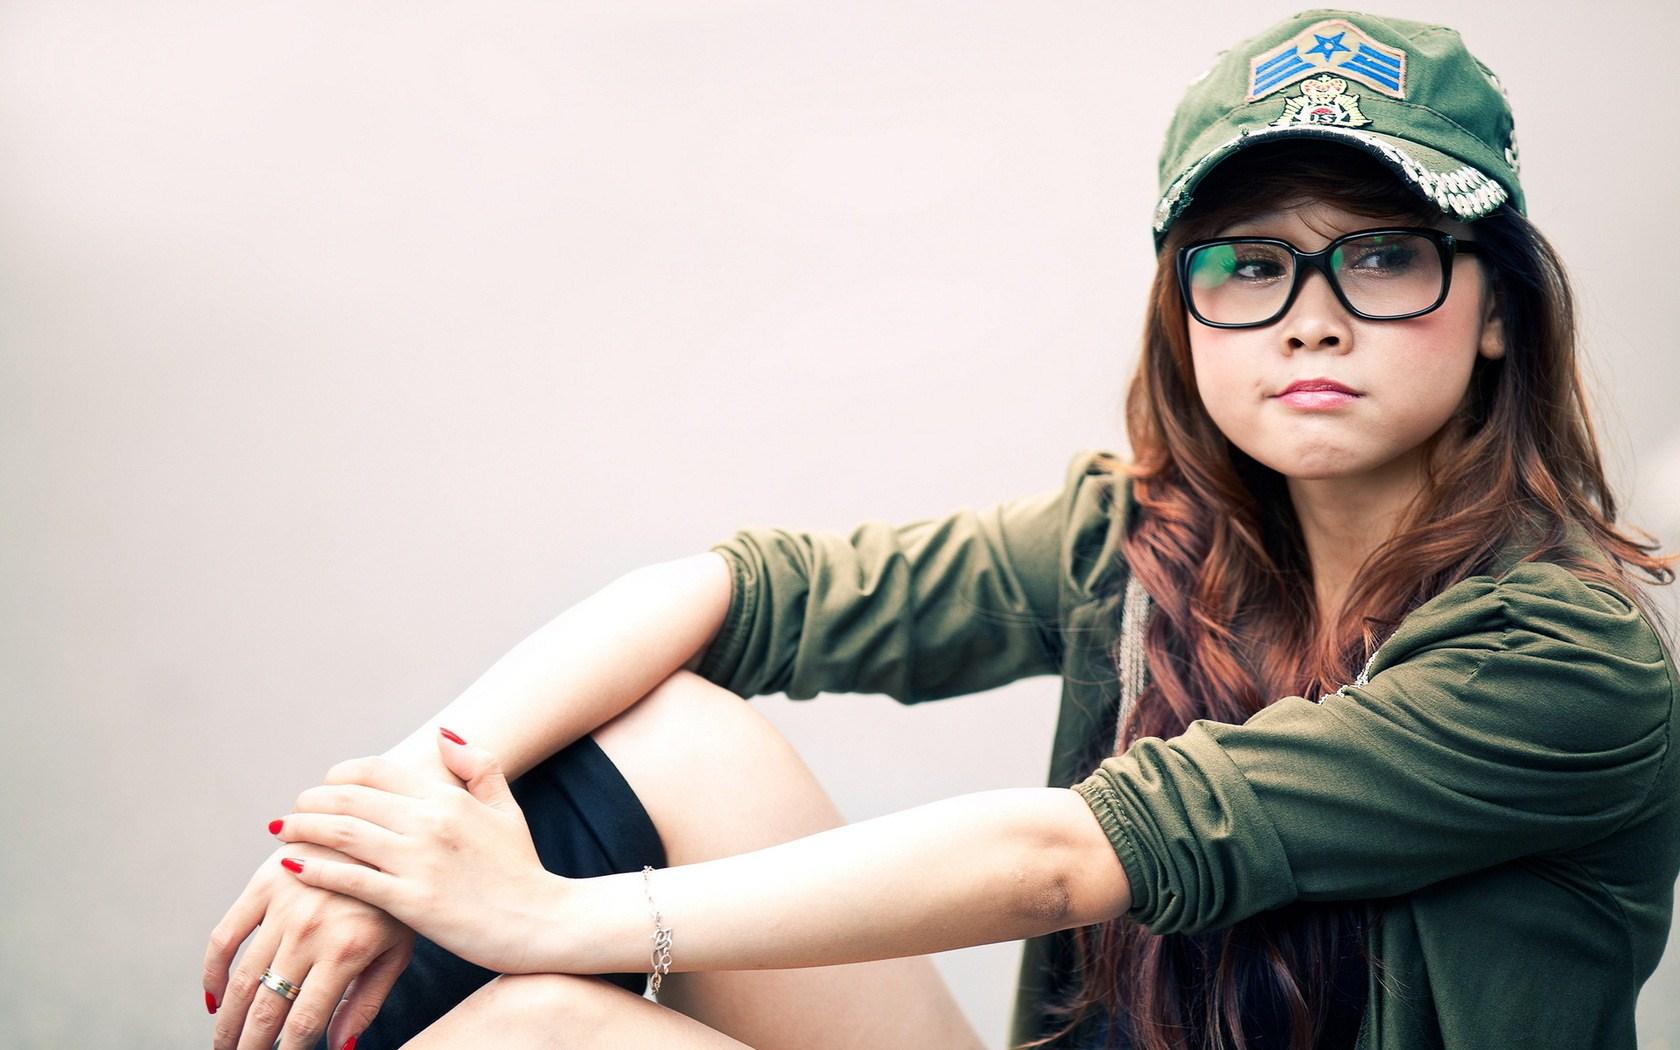 Girl Glasses HD wallpaper 1680x1050 26096 1680x1050